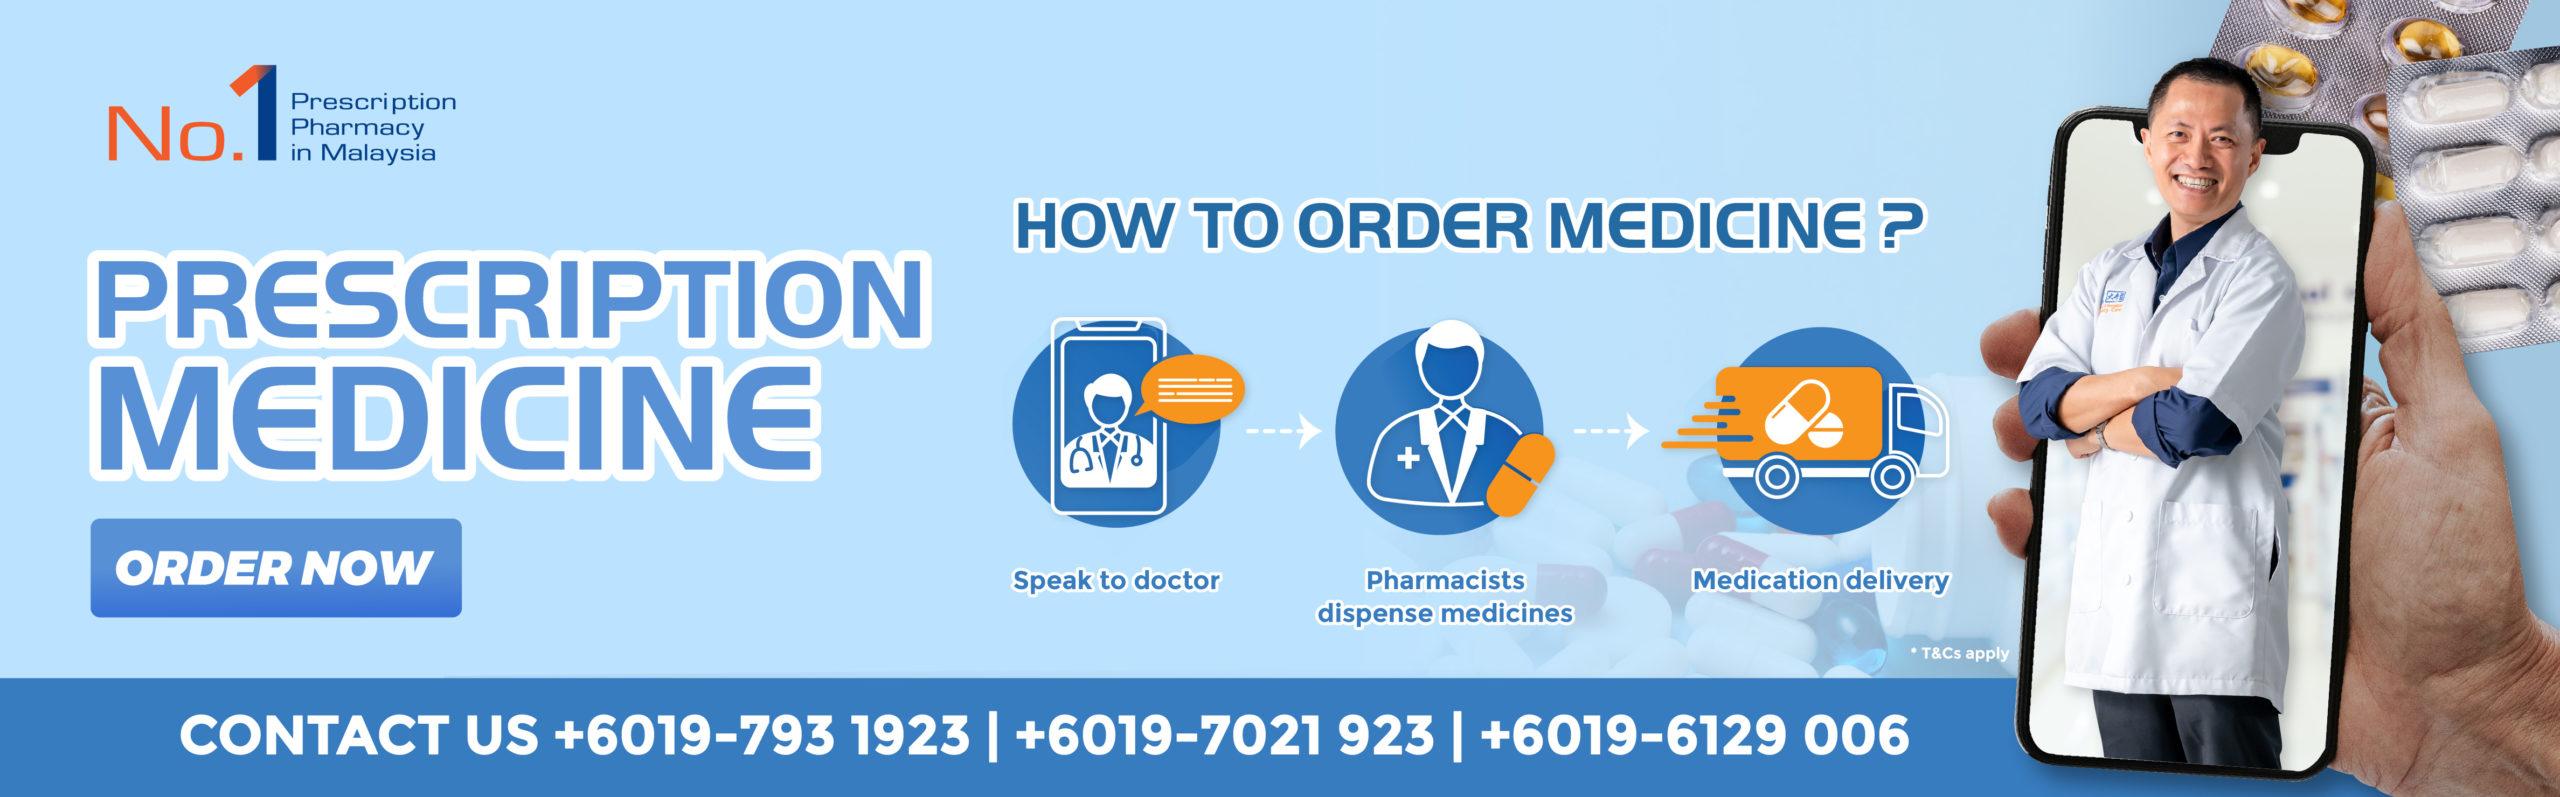 https://www.alpropharmacy.com/oneclick/category/drugs-prescription-medicine/